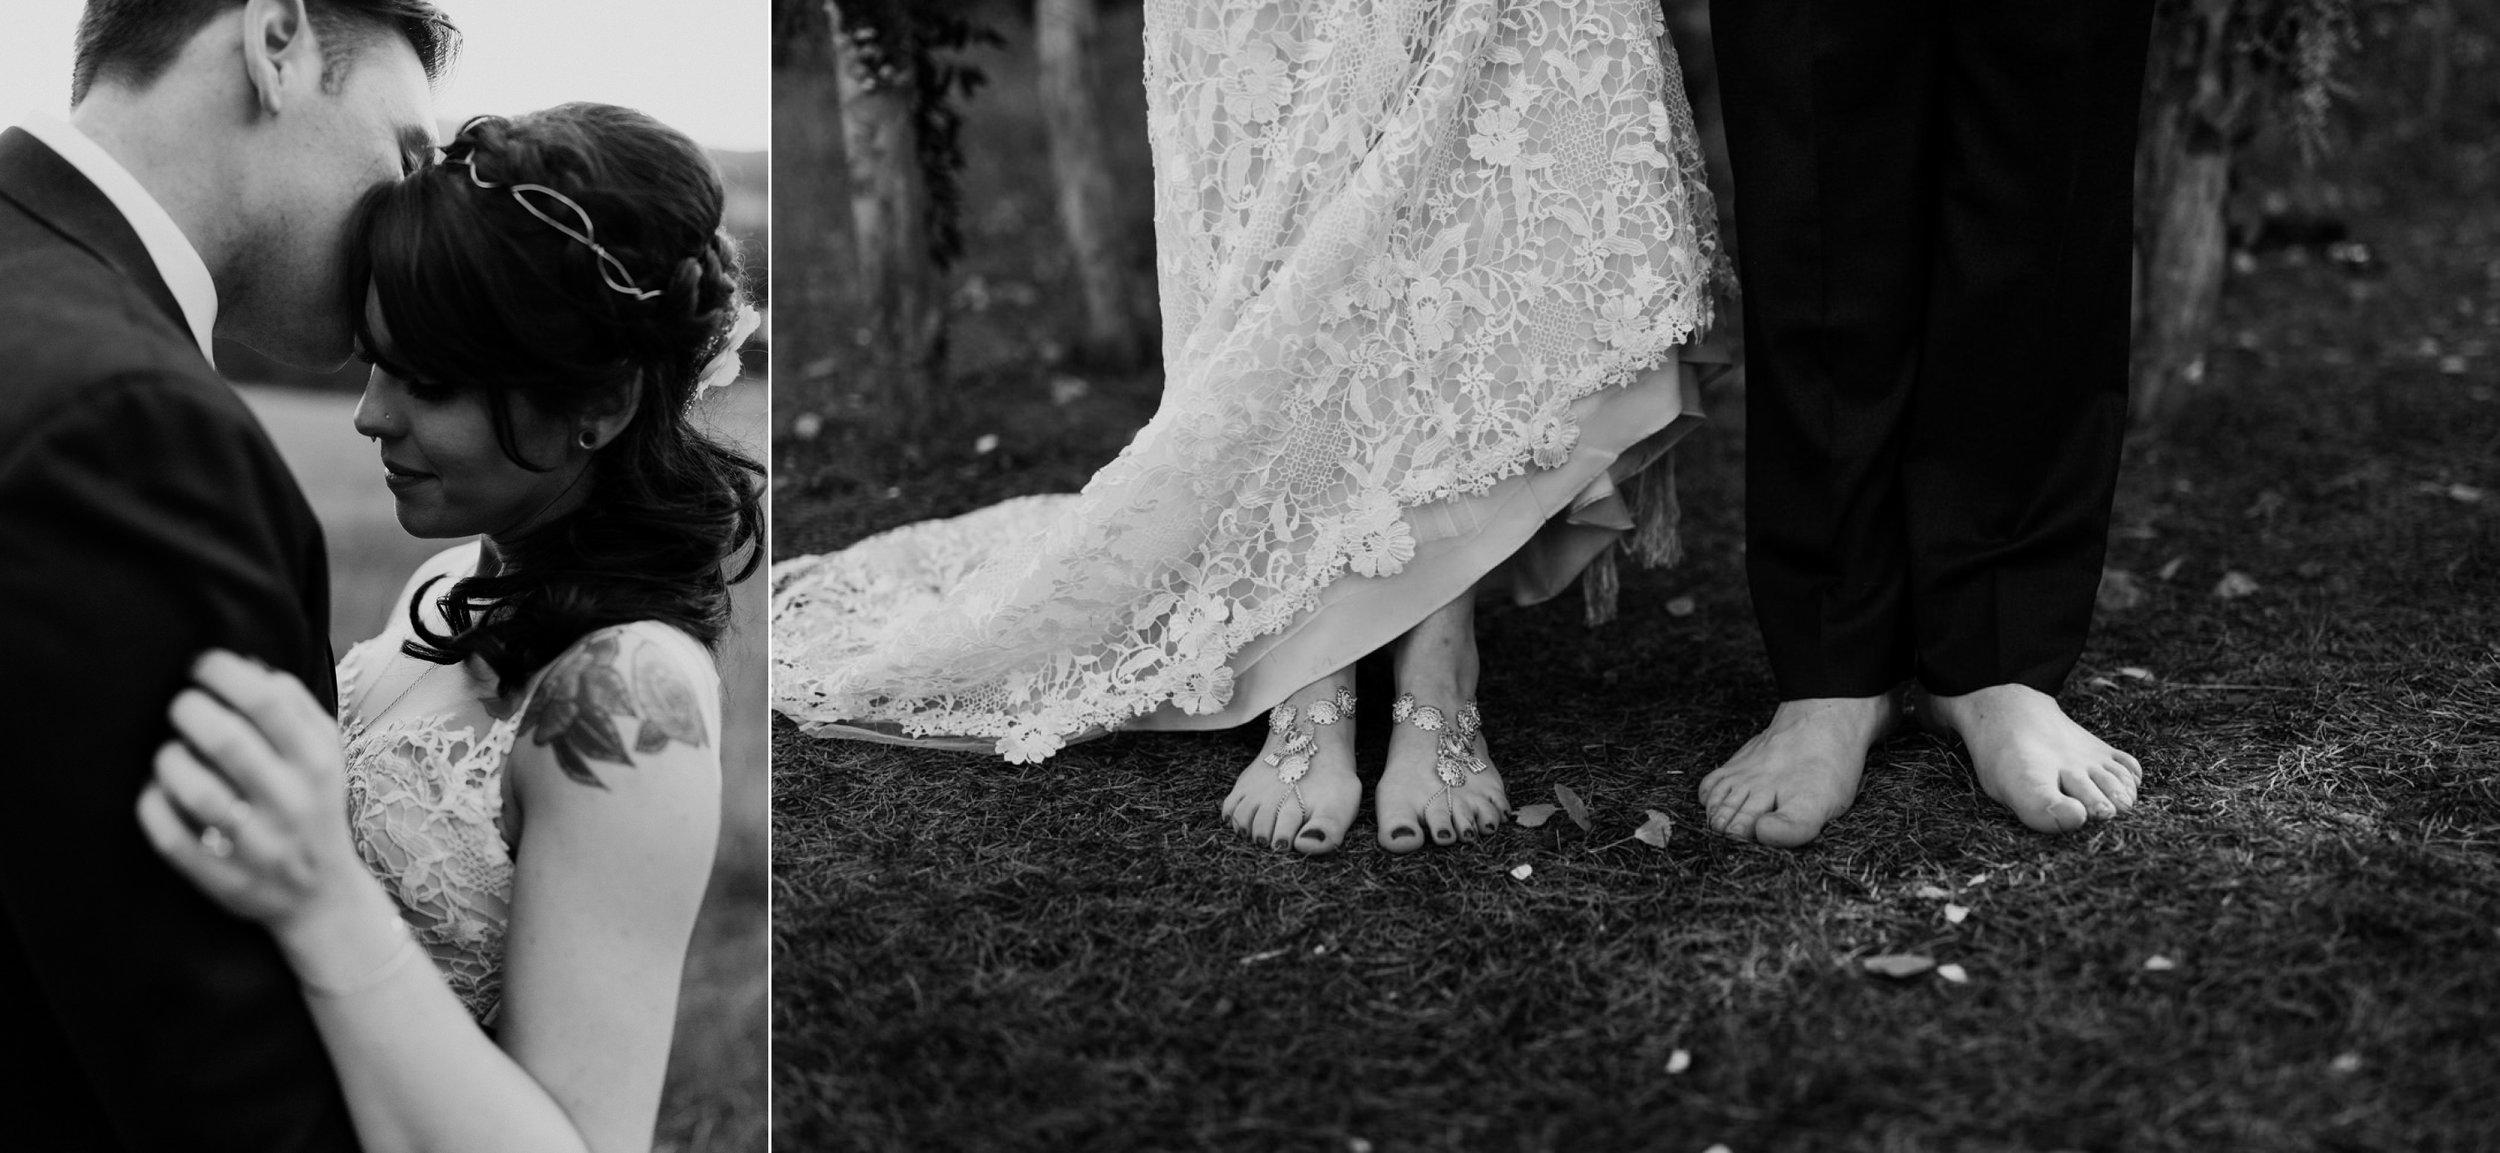 17-10-adventure-wedding-photographer-32.jpg